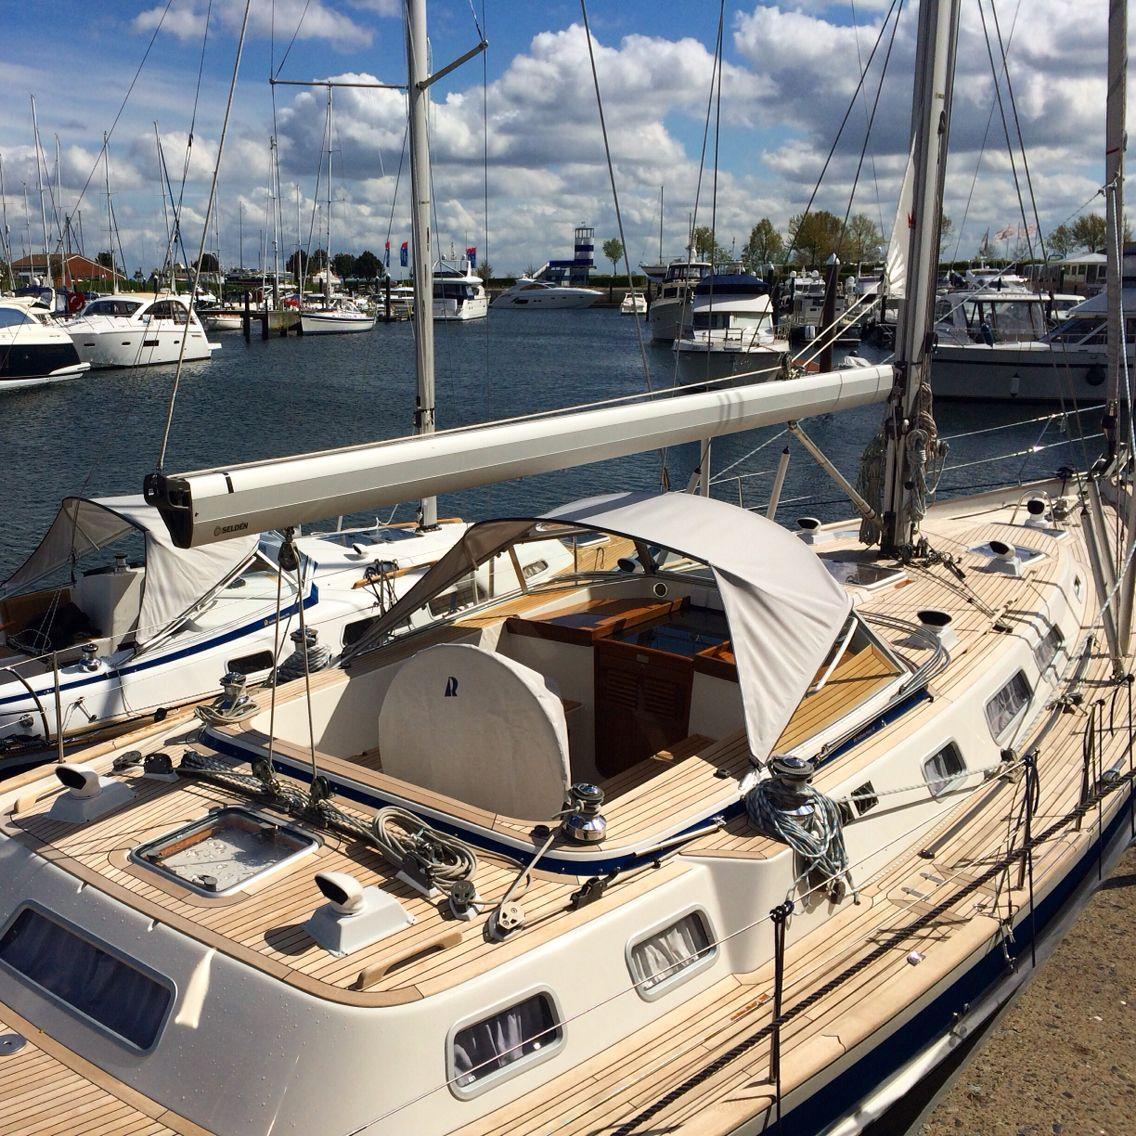 #hallbergrassy#oceansailing #Sailing #sailingstagram #worldcruisingonline